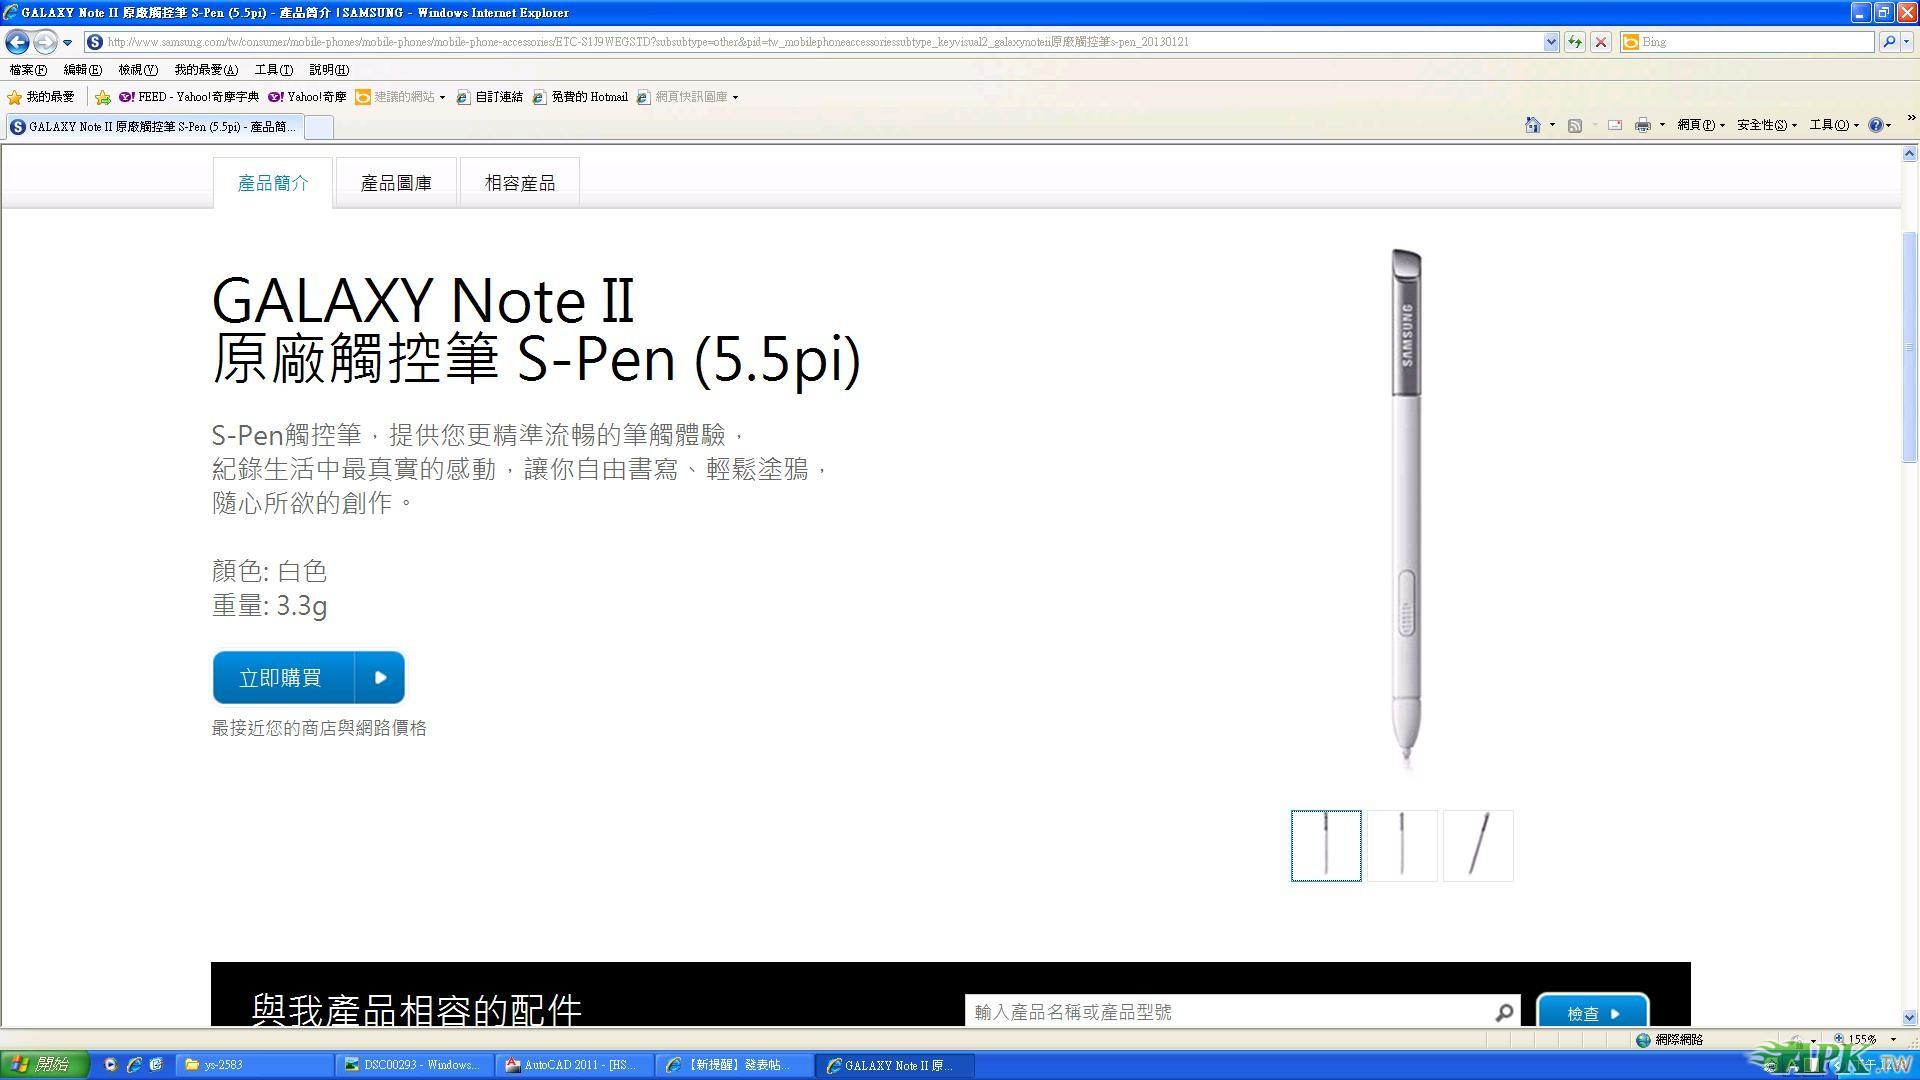 S-Pen.JPG